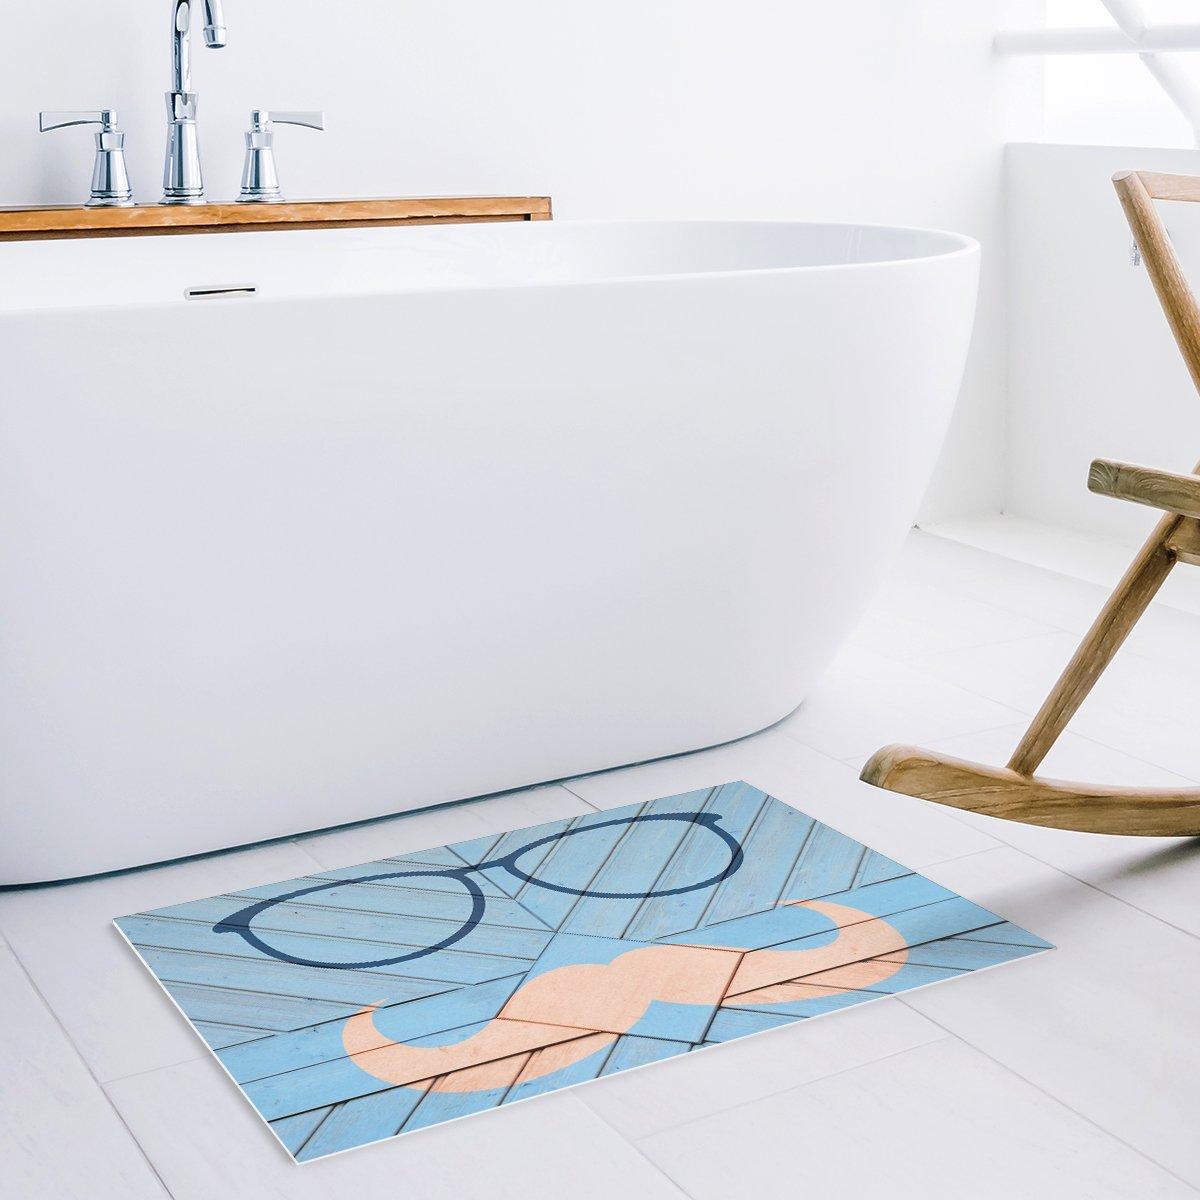 Funny Blue Wood Geometric Glasses Beard Bowtie Door Mats Kitchen Floor Bath Entrance Rug Mat Rubber Non Slip